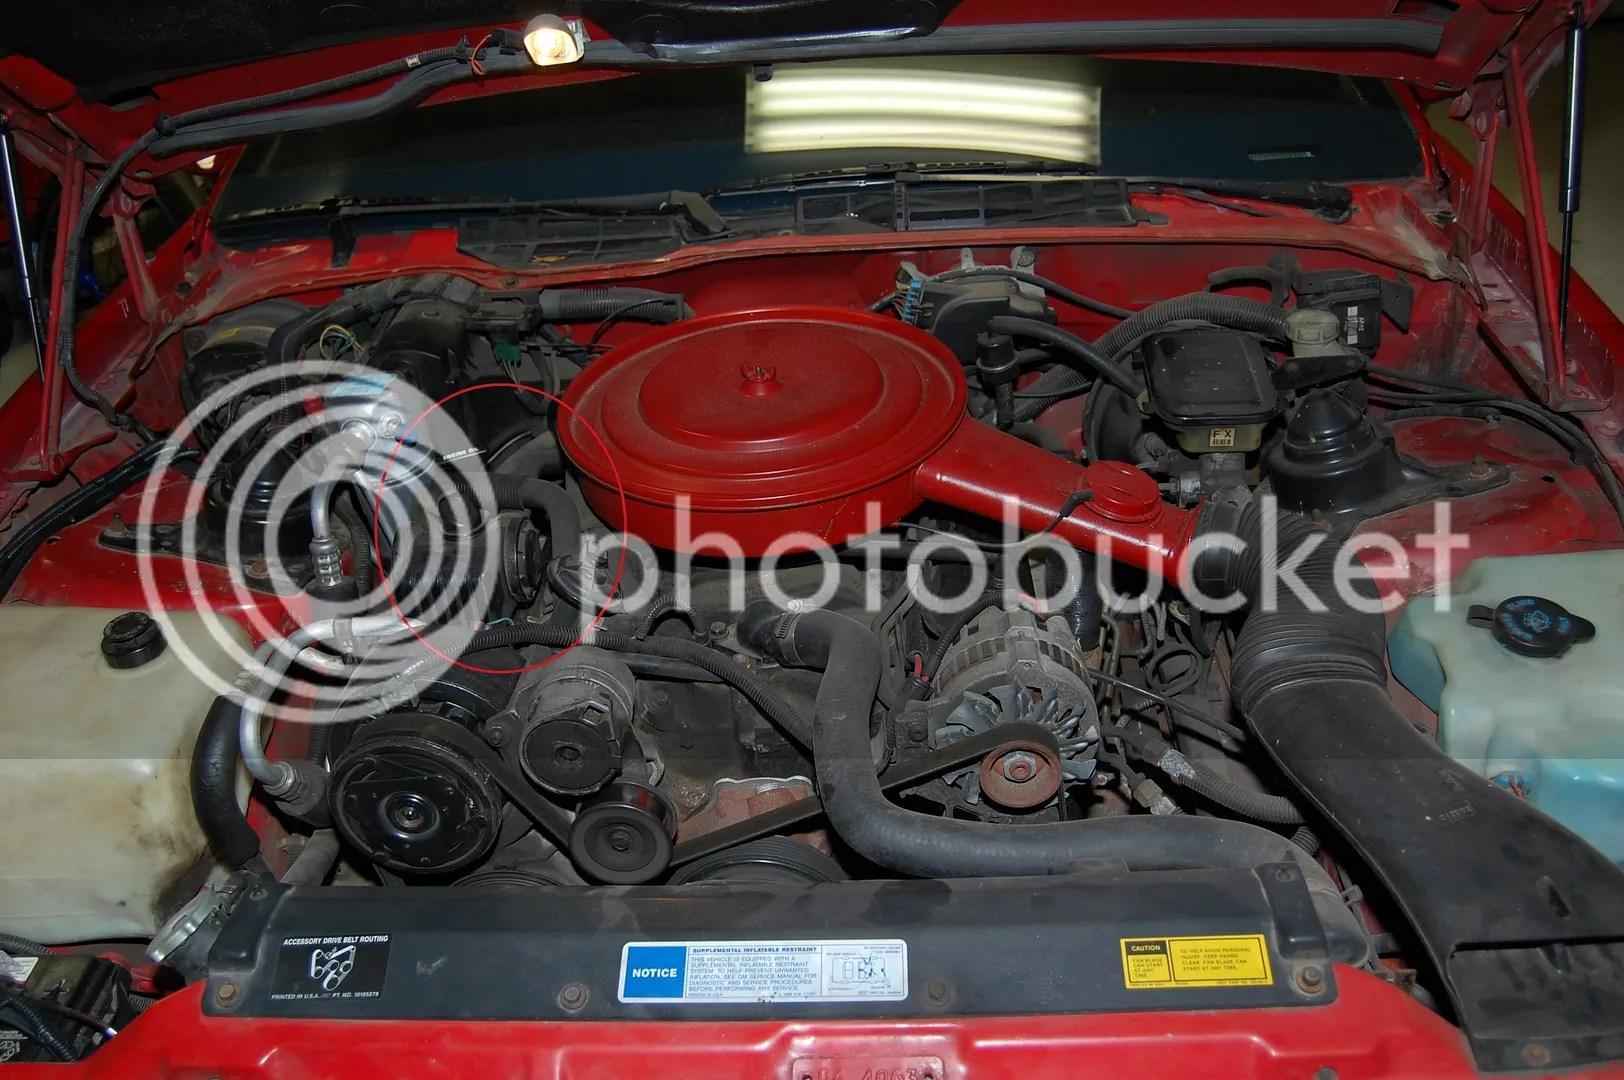 hight resolution of 92 camaro fuel pump wiring diagram trusted wiring diagram 95 chevy camaro fuse diagram 1992 camaro